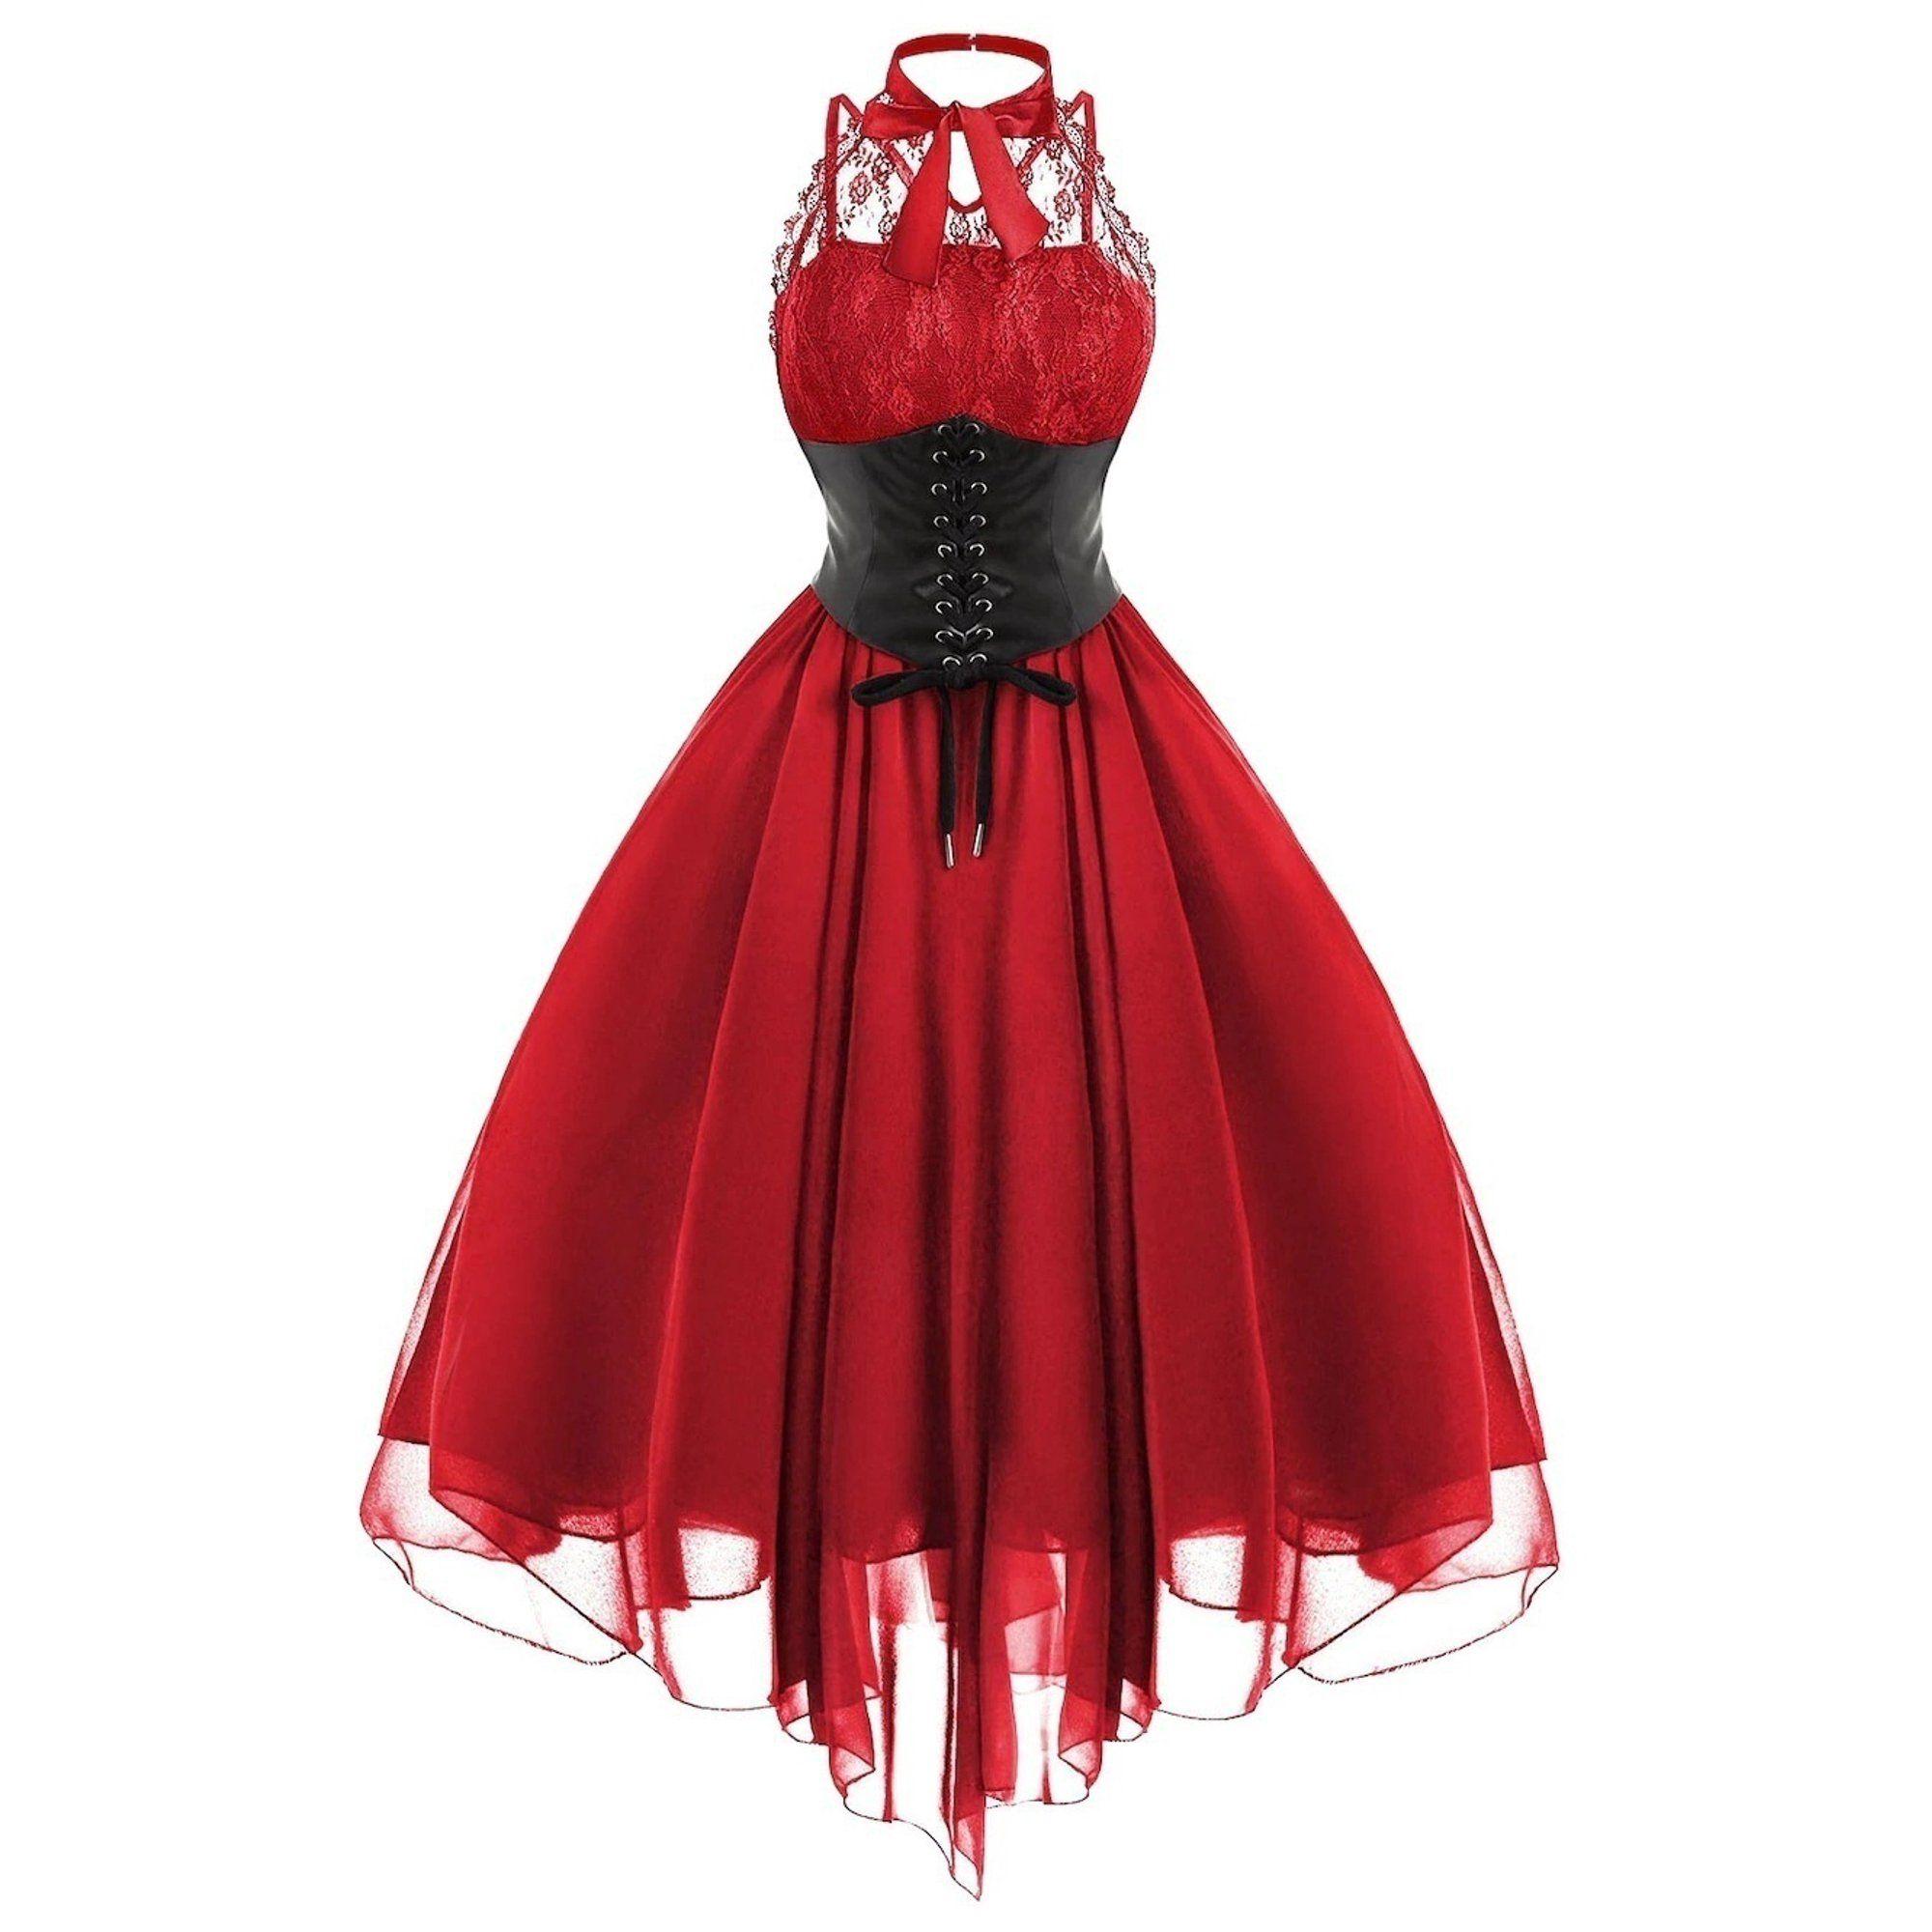 Lovaru Lace Panel Cross Back Gothic Corset Dress Walmart Com Gothic Corset Dresses Goth Dress Womens Dresses [ 2000 x 2000 Pixel ]